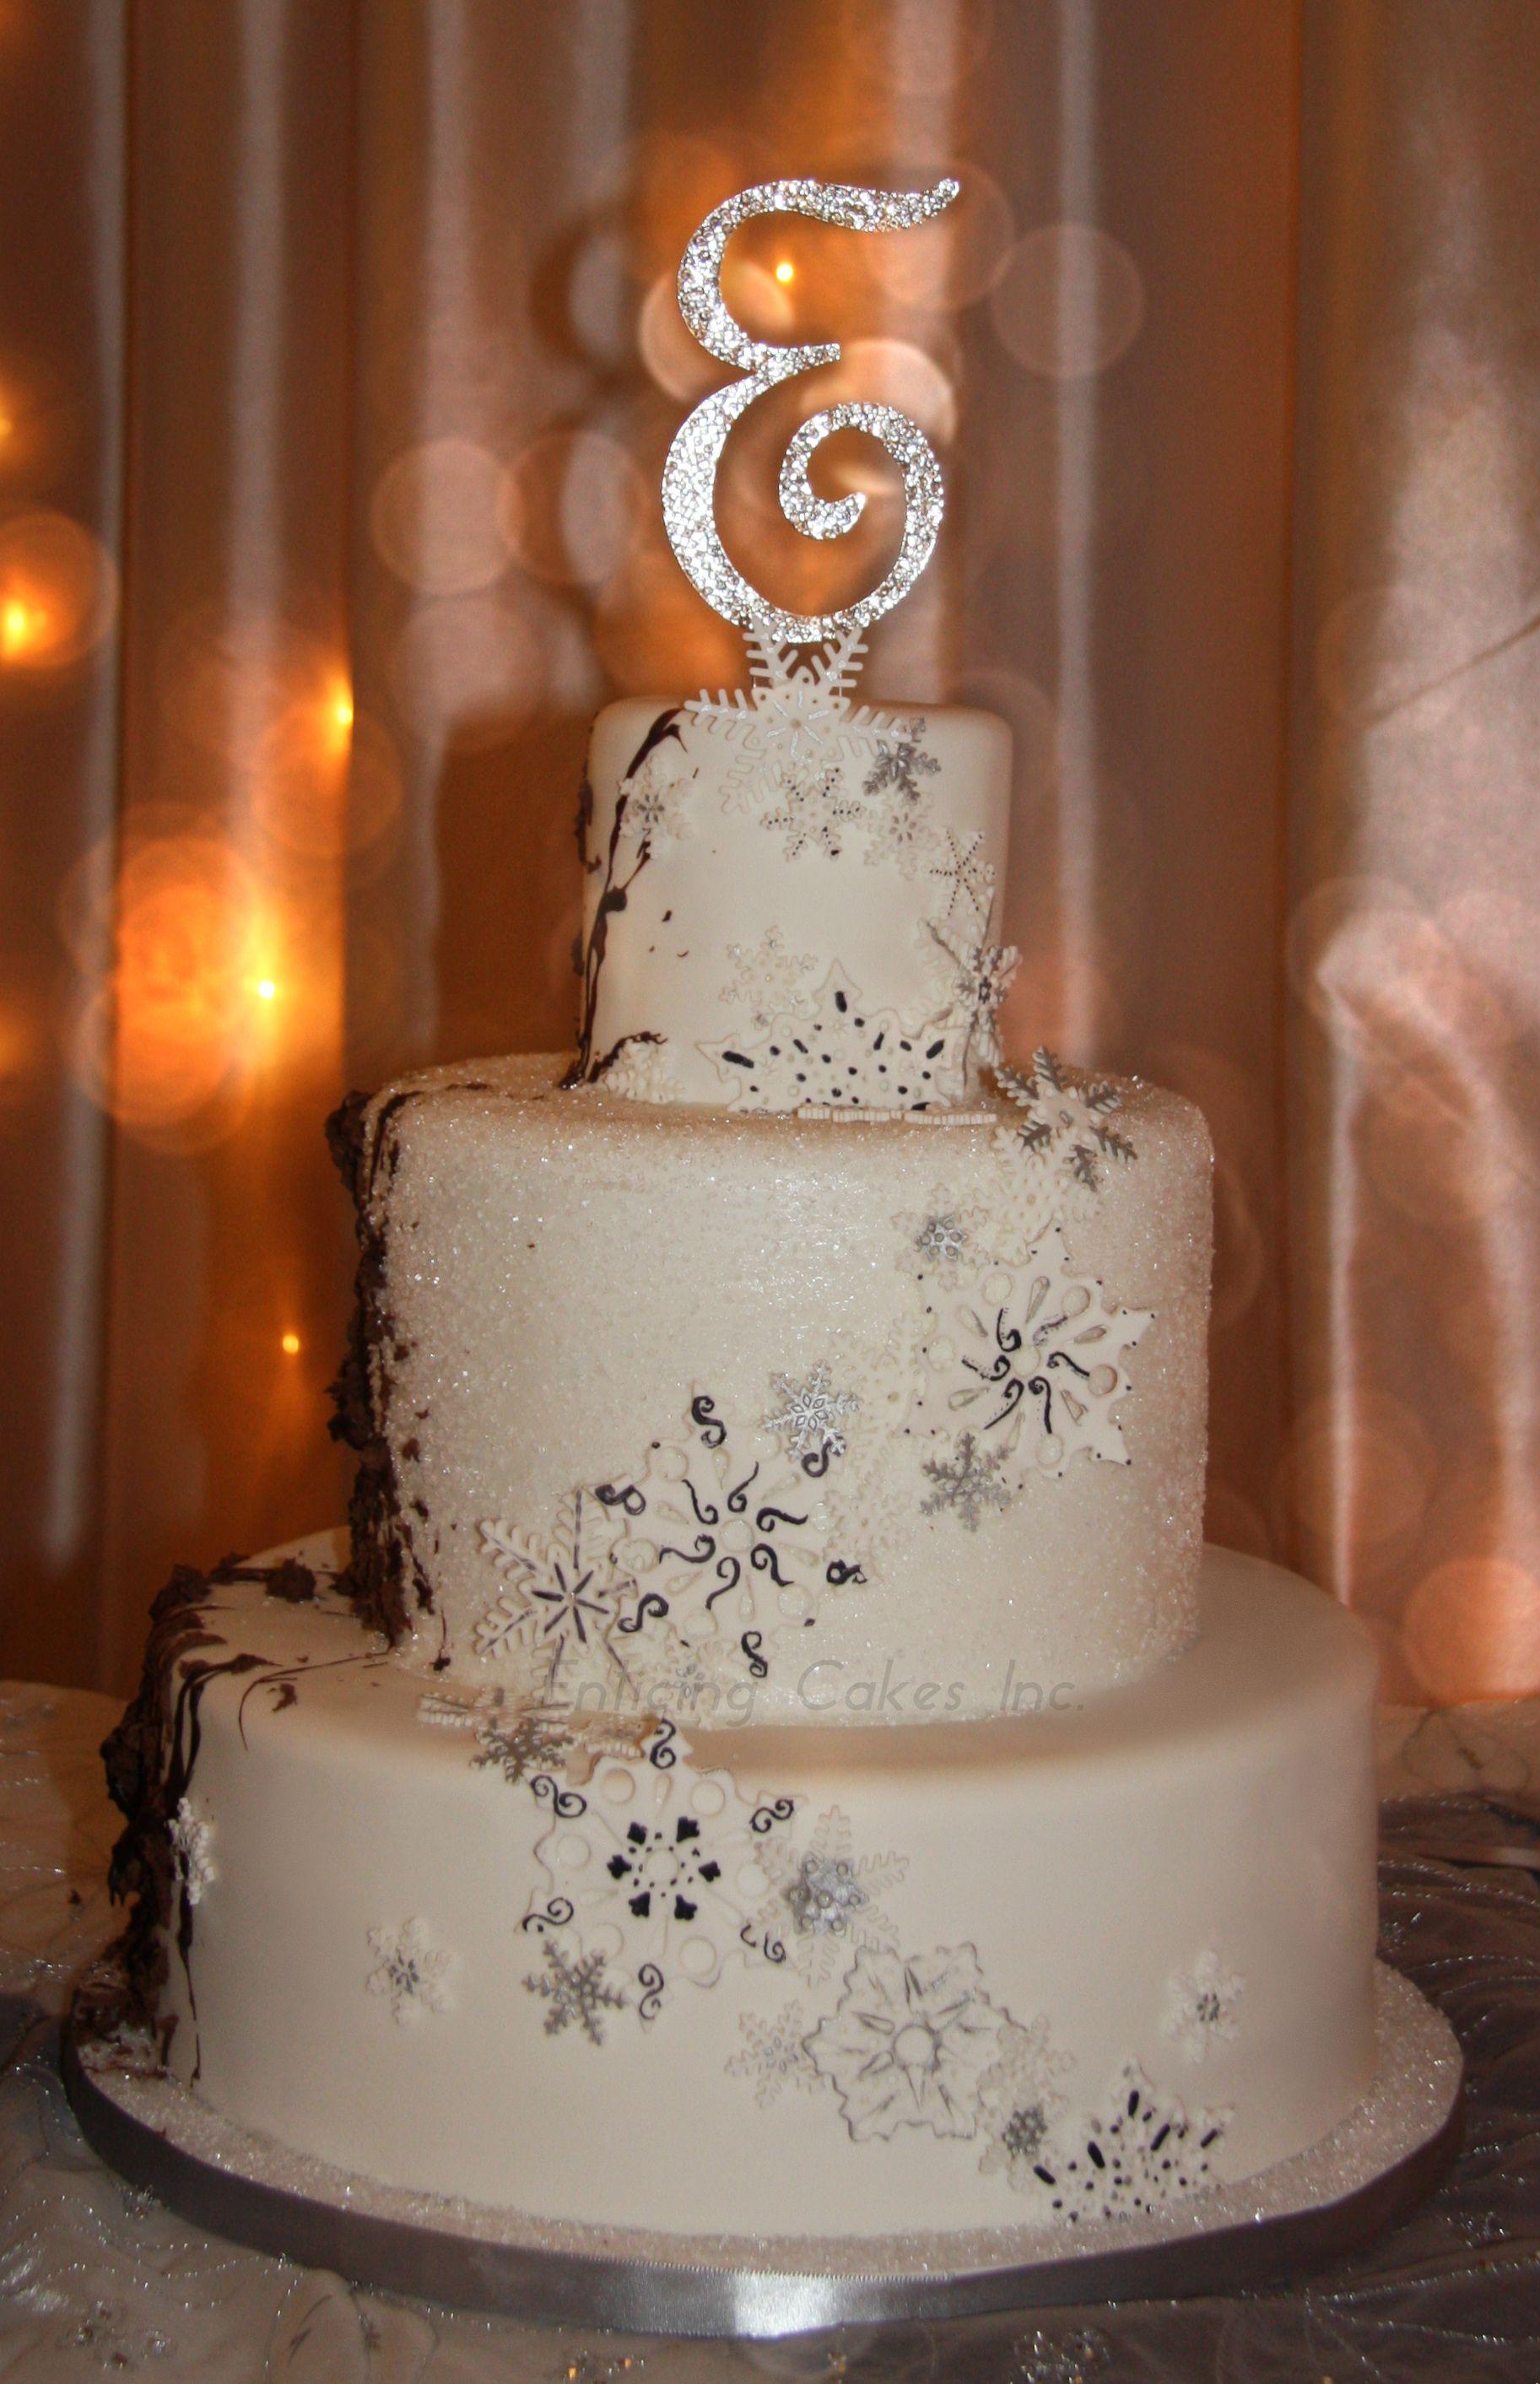 Winter Wonderland Wedding Cake   Wedded Bliss   Pinterest ...